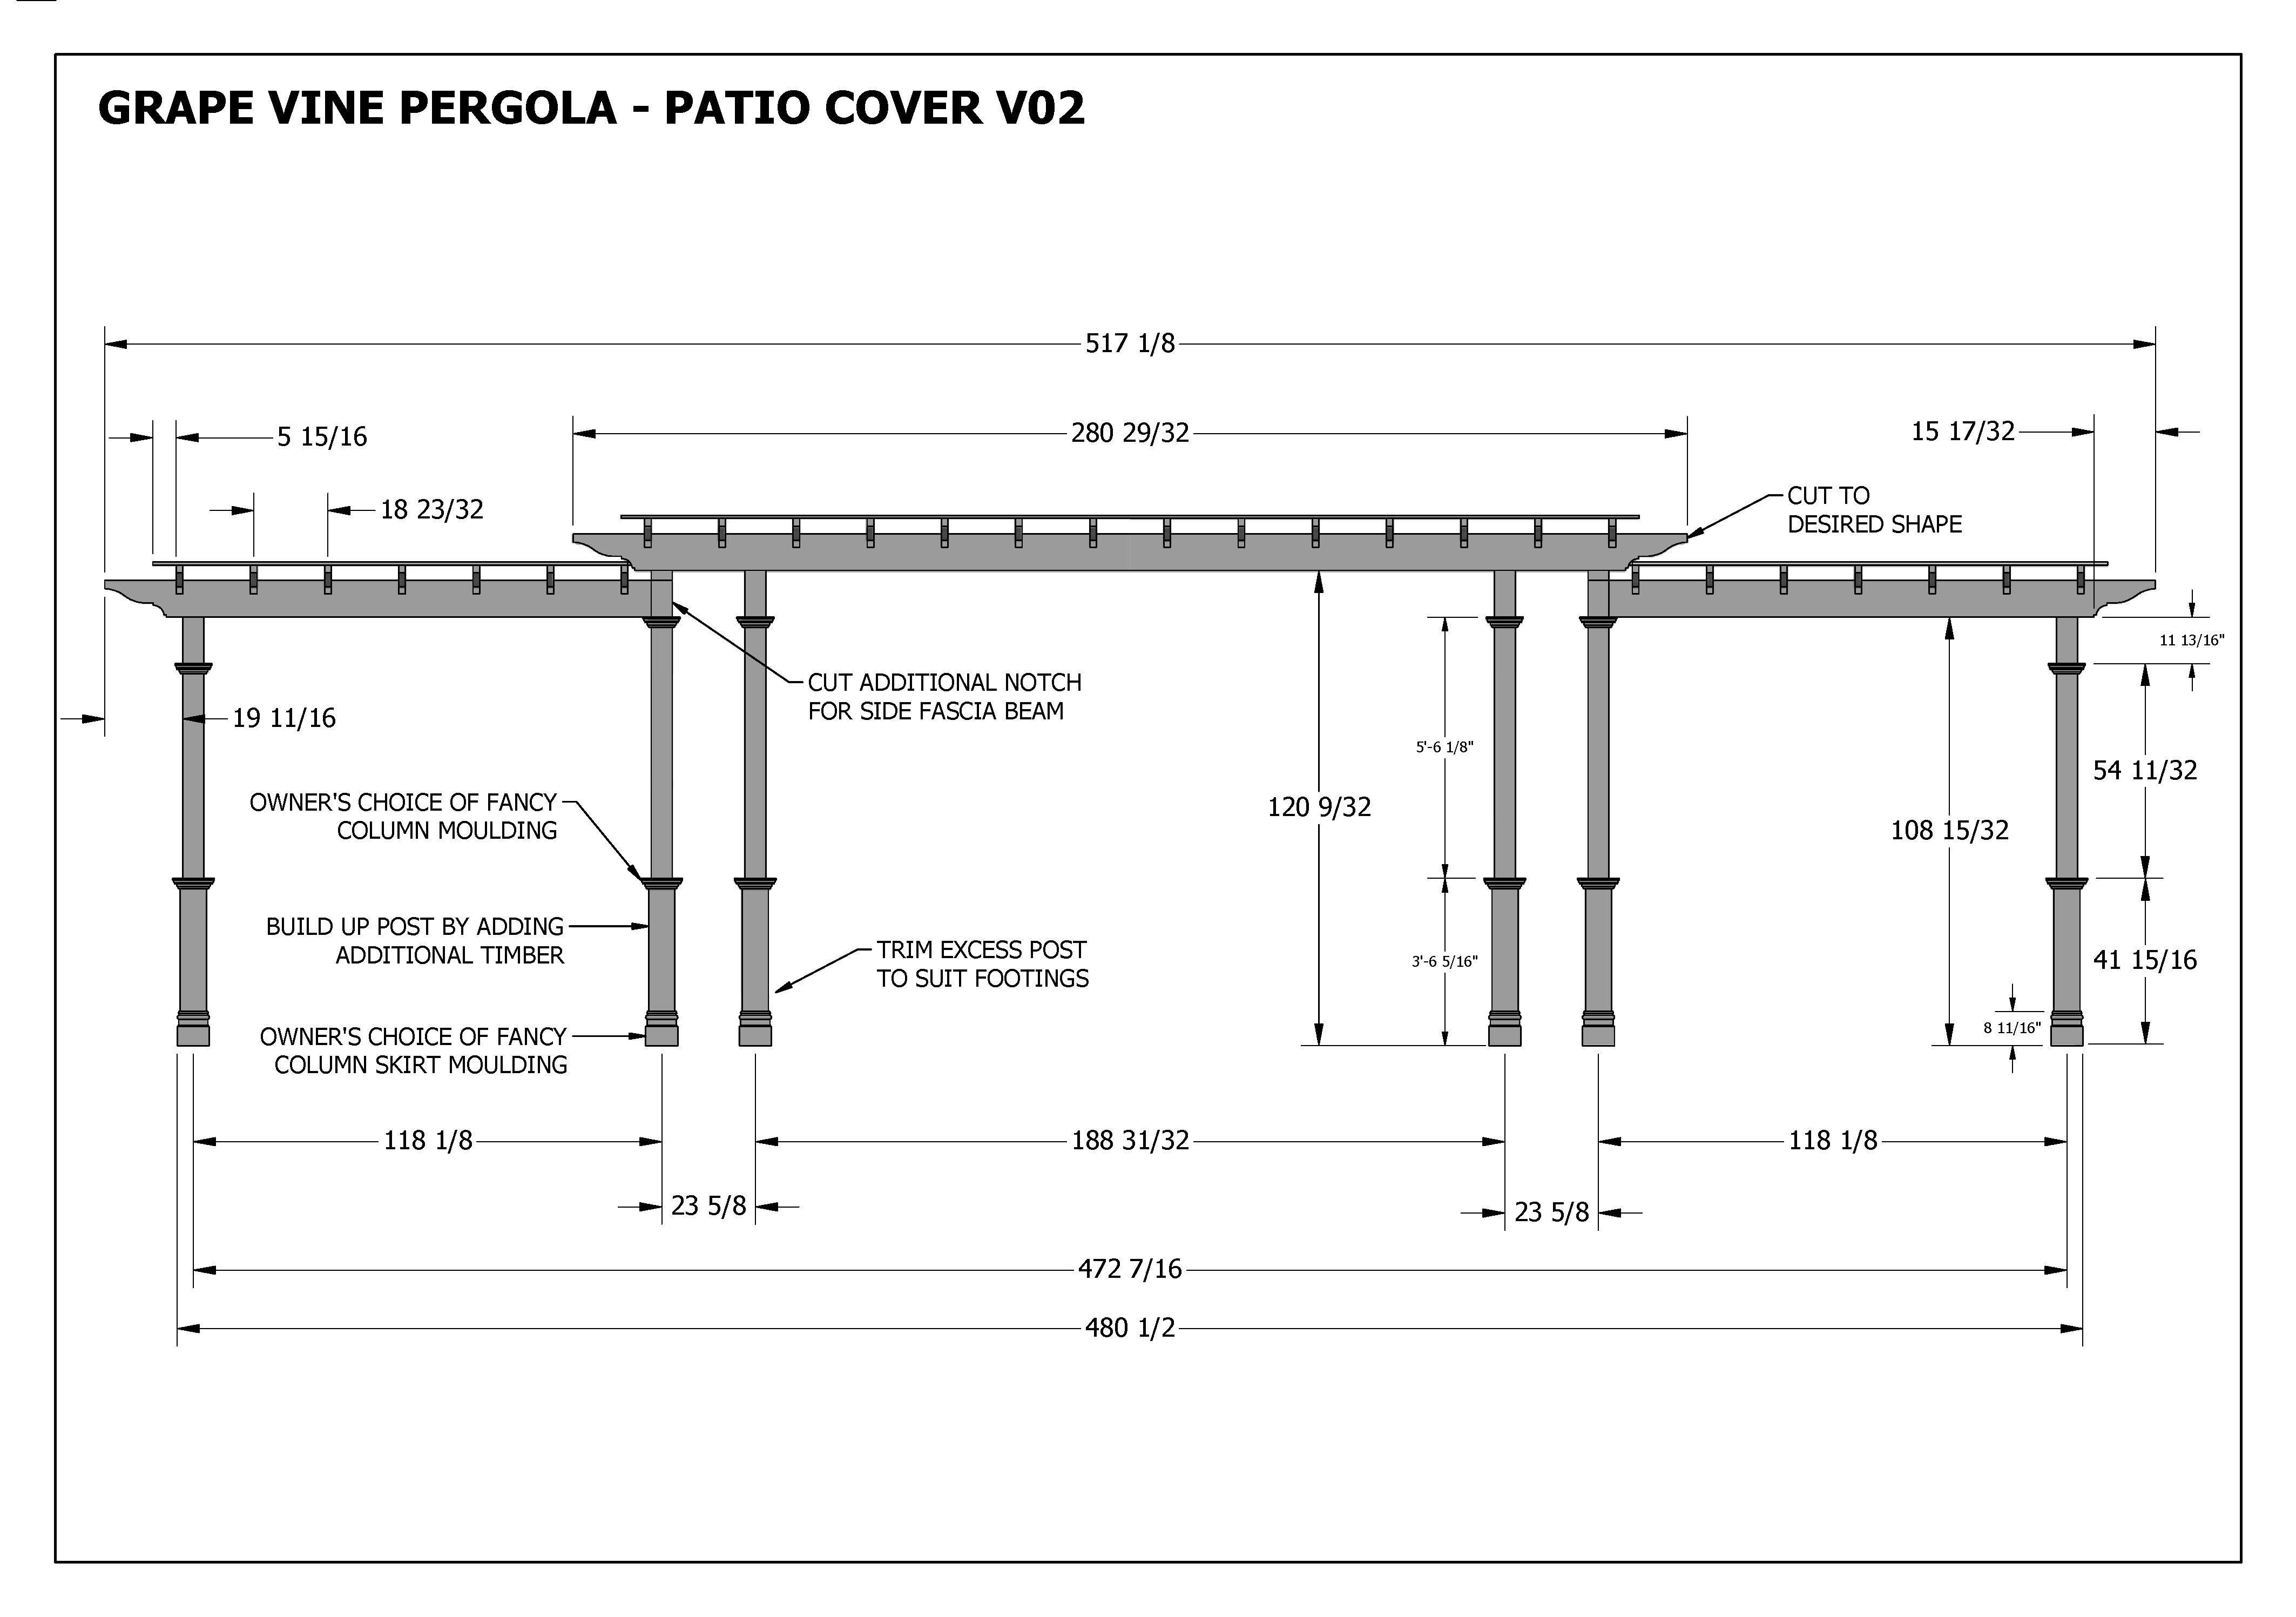 GRAPE VINE PERGOLA - OUTDOOR PATIO COVER - V2 Full ... on Patio Cover Decorating Ideas id=12438